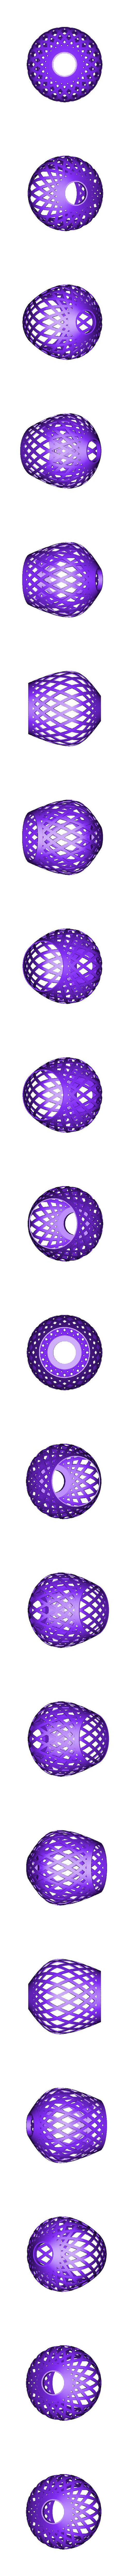 tulipa.stl Download free STL file Geometrical lamp • 3D print template, sjgutierrez9